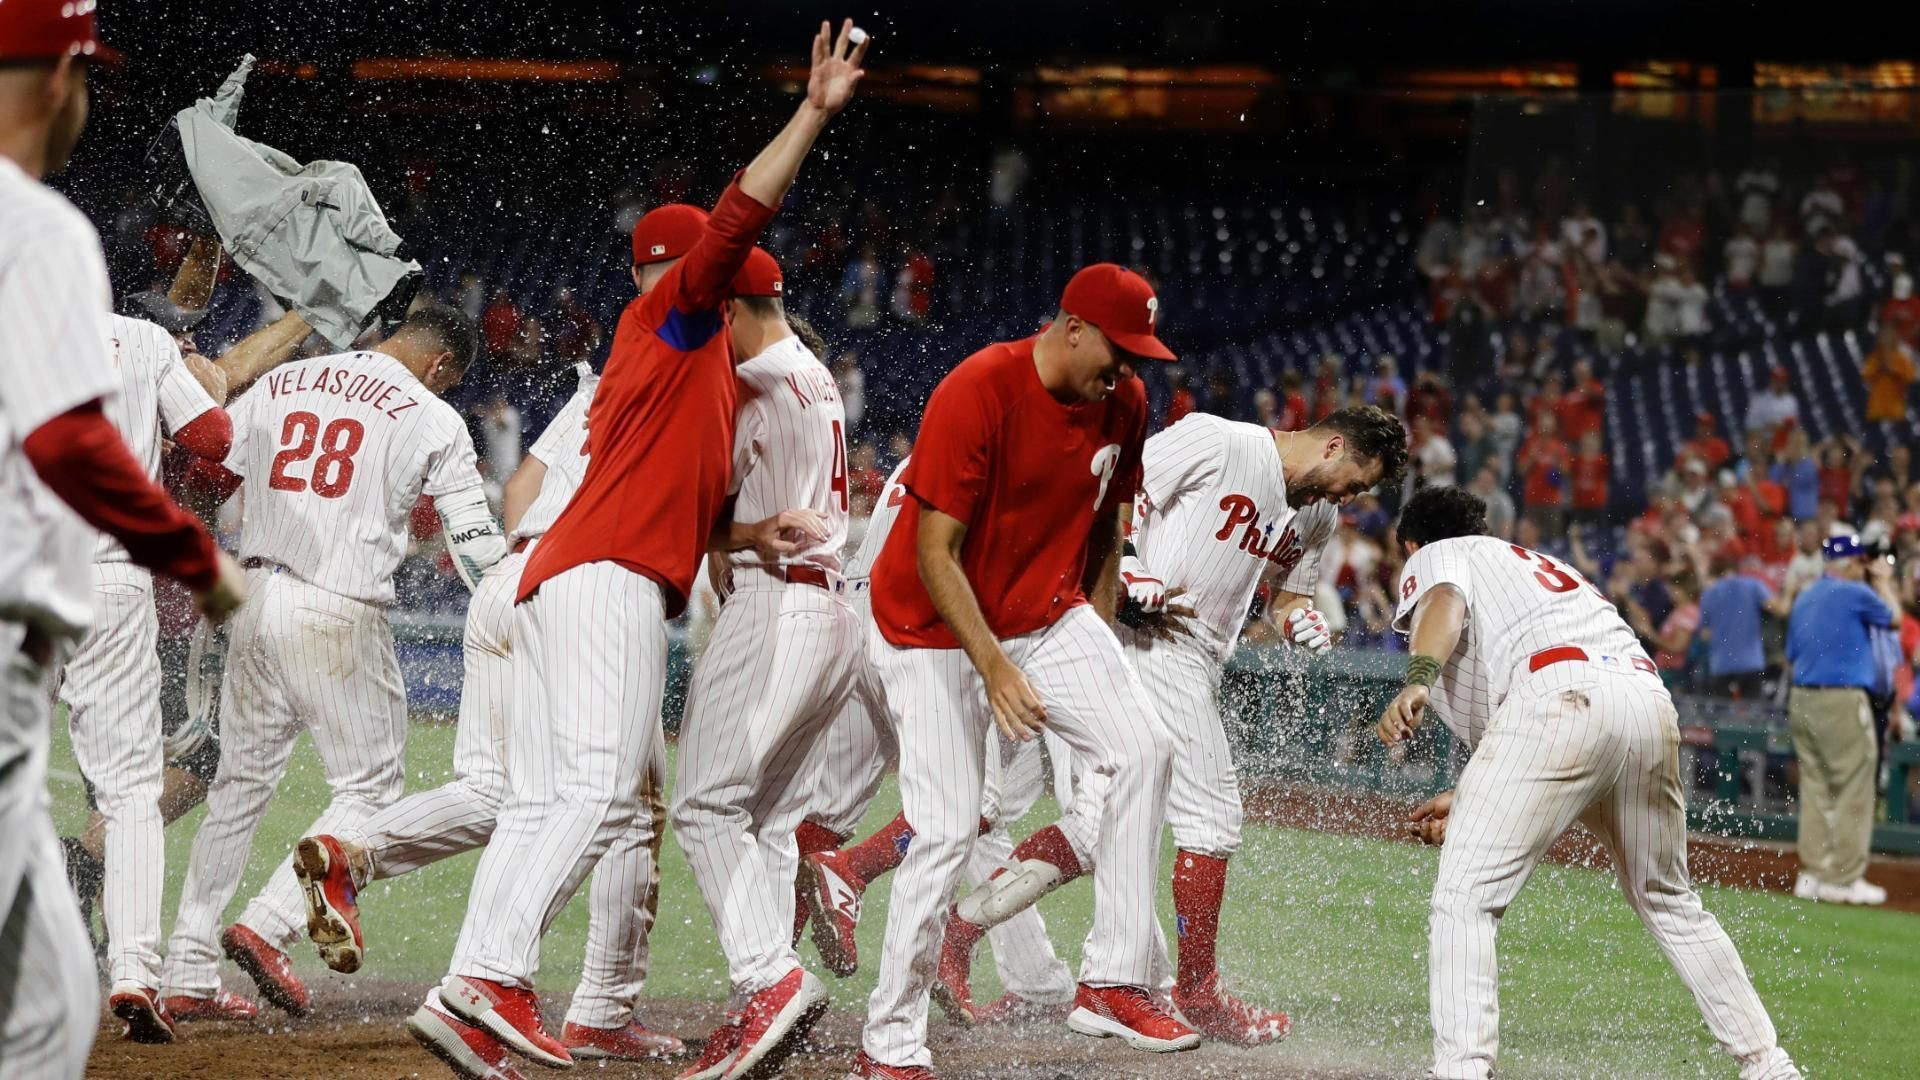 https://secure.espncdn.com/combiner/i?img=/media/motion/2018/0725/dm_180725_MLB_One_Play_Plouffe_homer_off_Kike_Hern133/dm_180725_MLB_One_Play_Plouffe_homer_off_Kike_Hern133.jpg